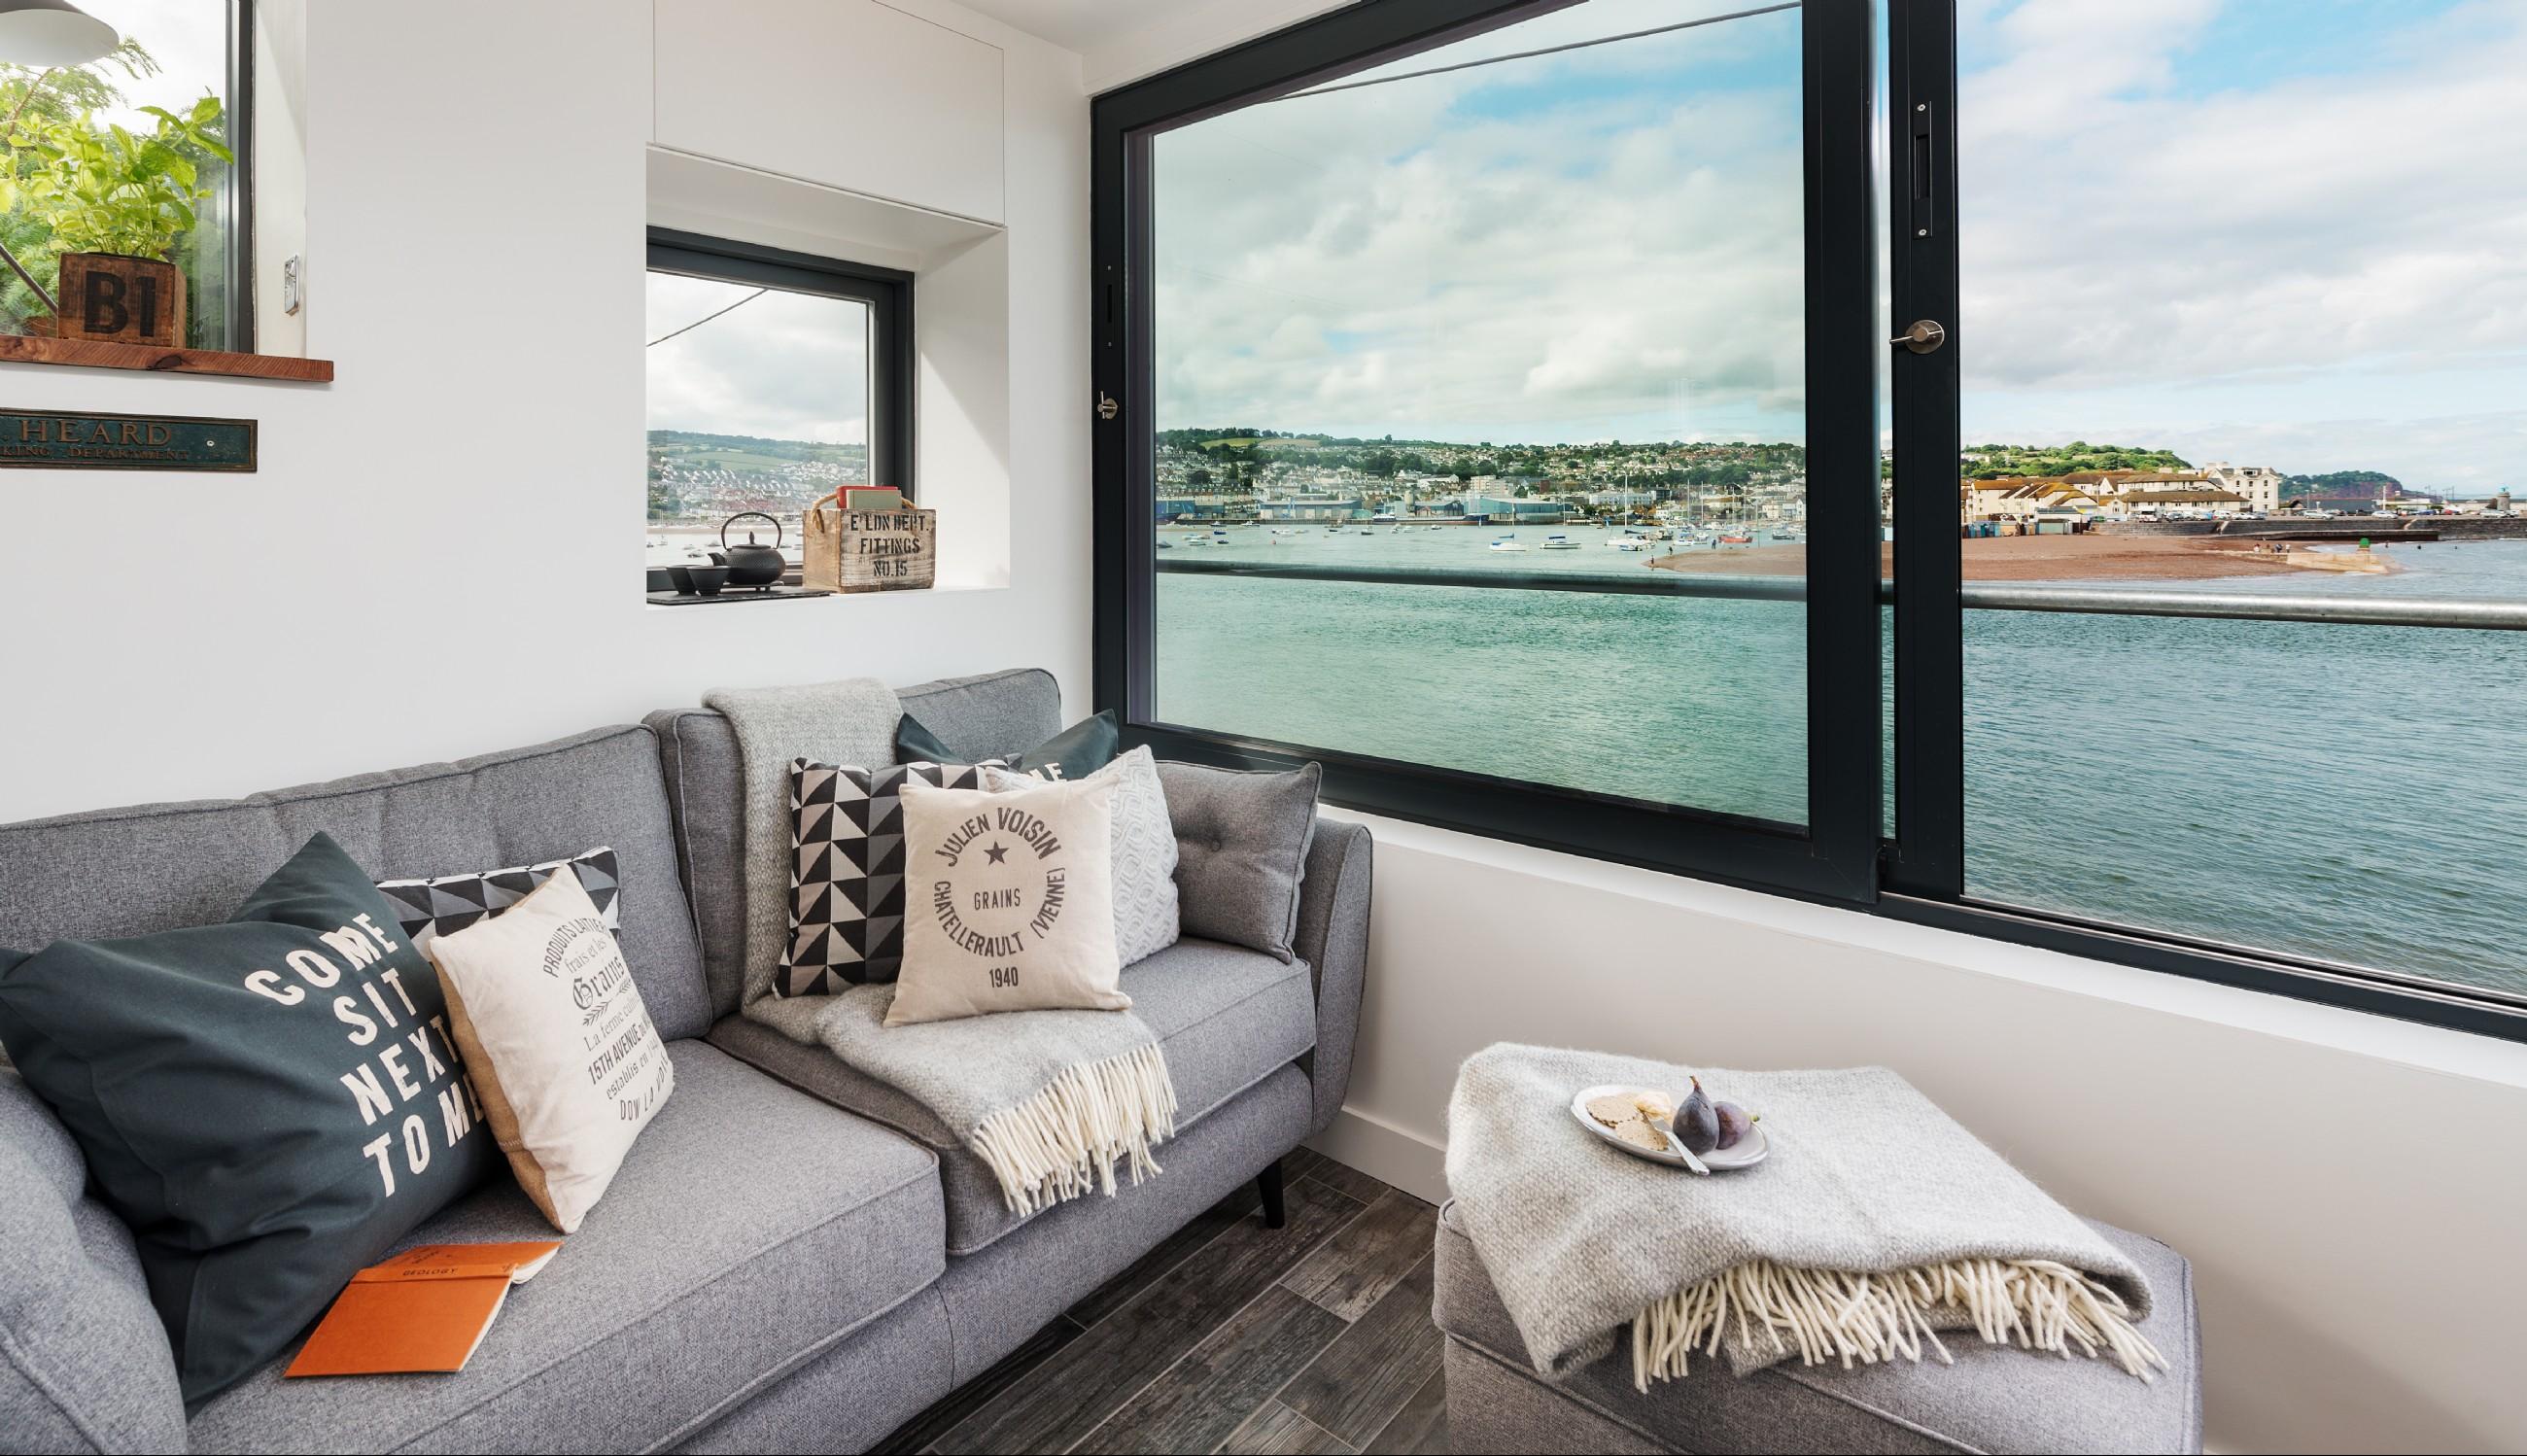 Shaldon Devon Luxury Self Catering Cottage Overlooking The Sea